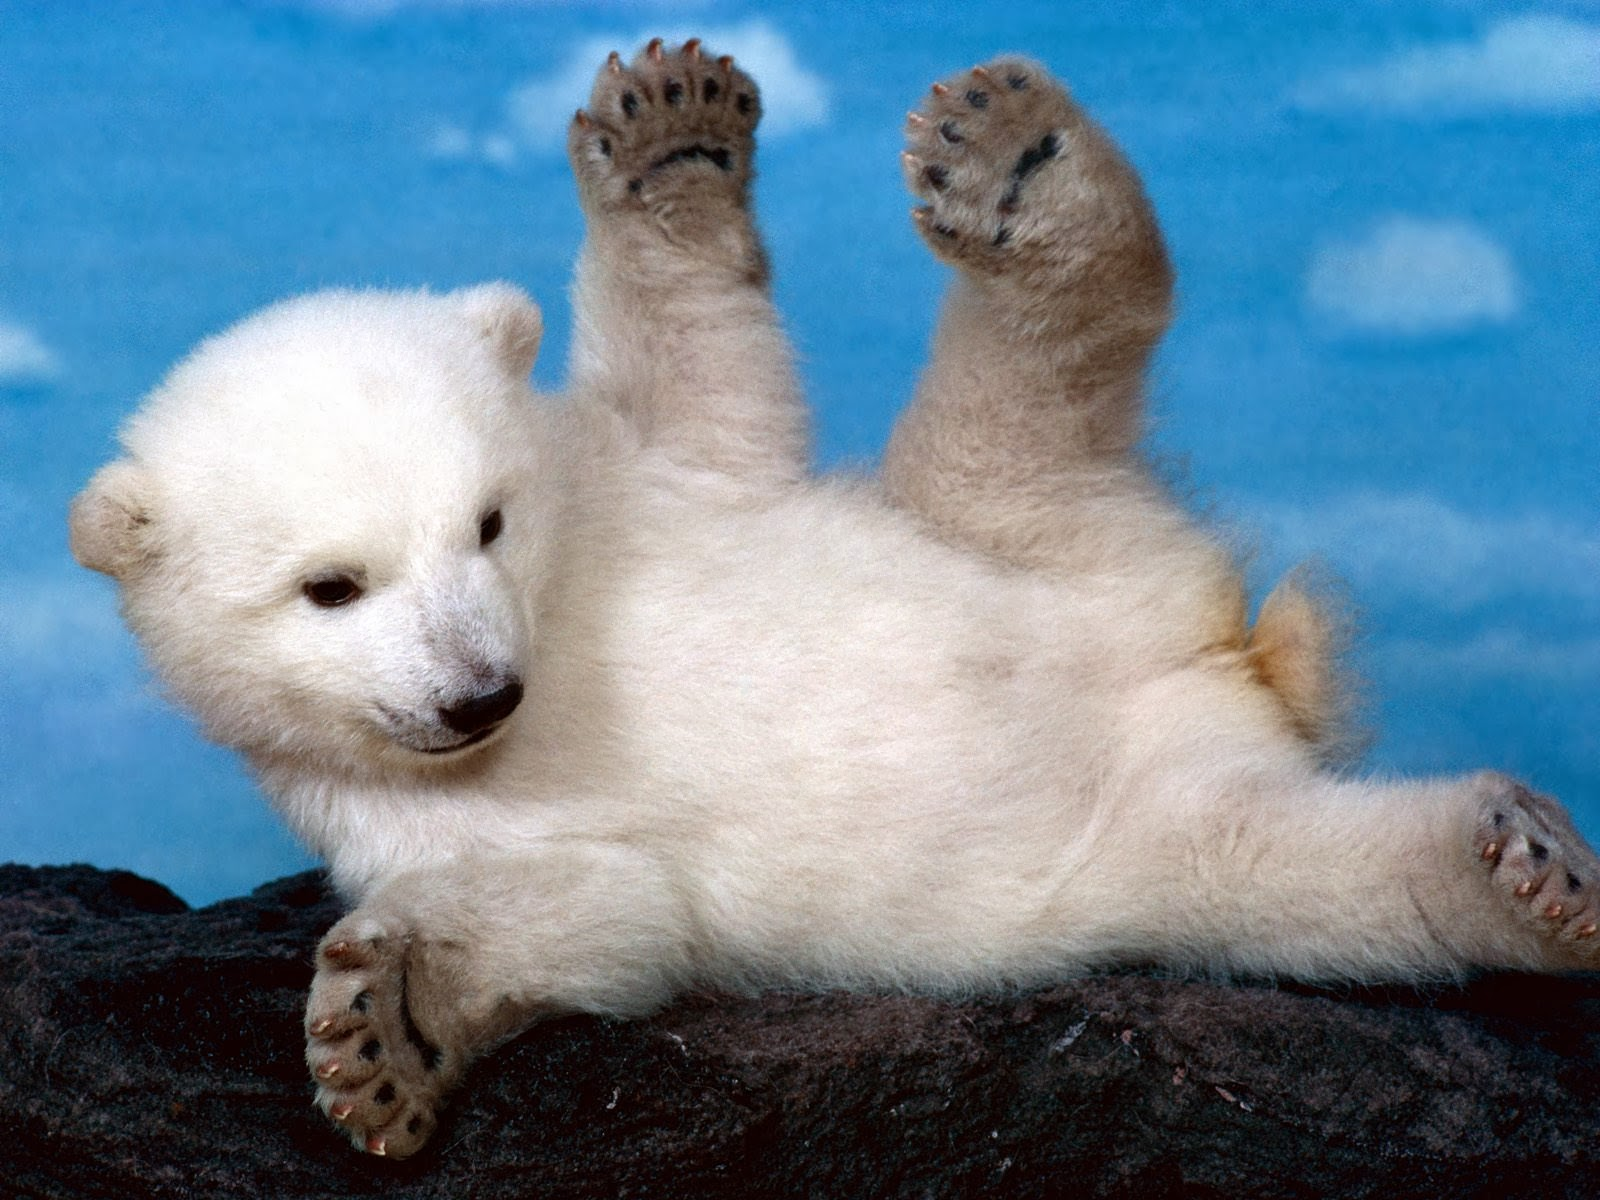 Cute Baby Polar Bear Wallpapers - Wallpaper - High Quality ...